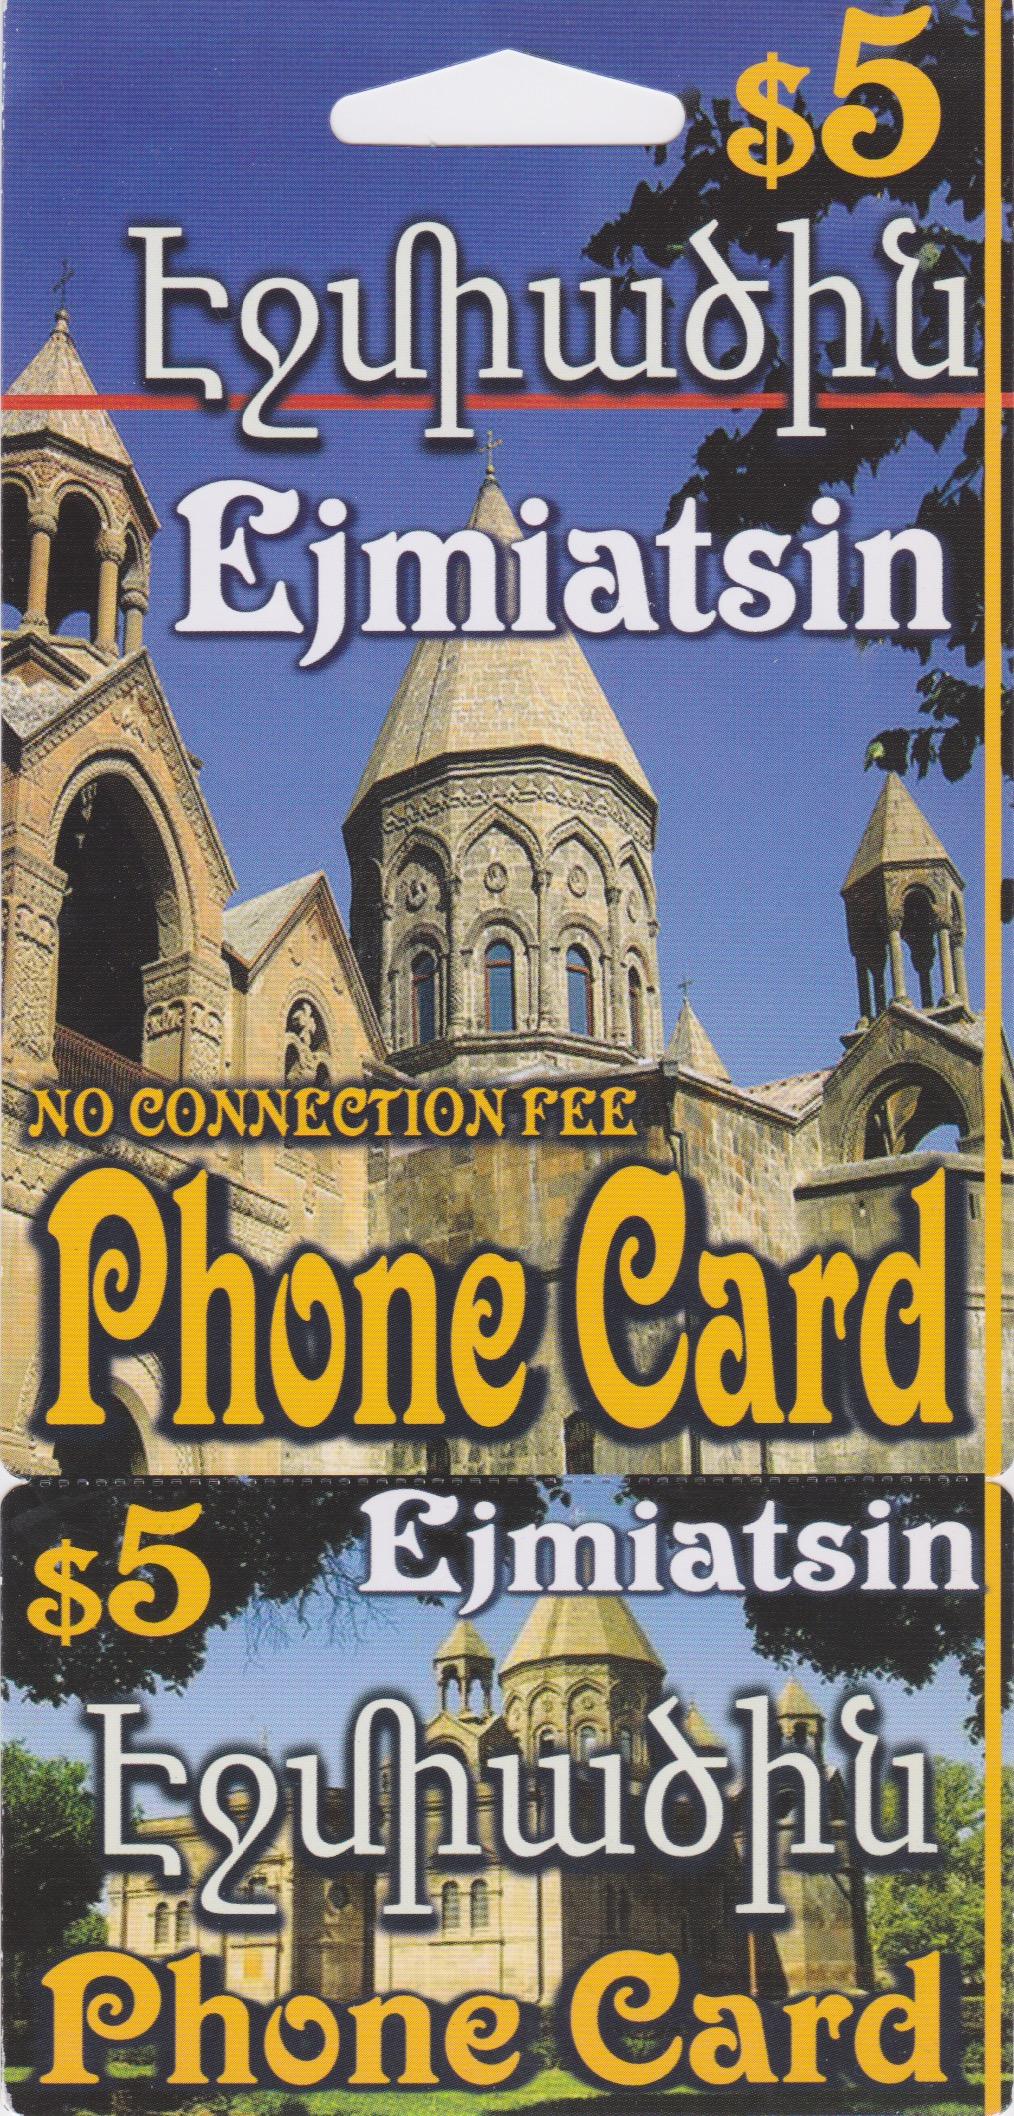 Ejmiatsin$5 — Armenia